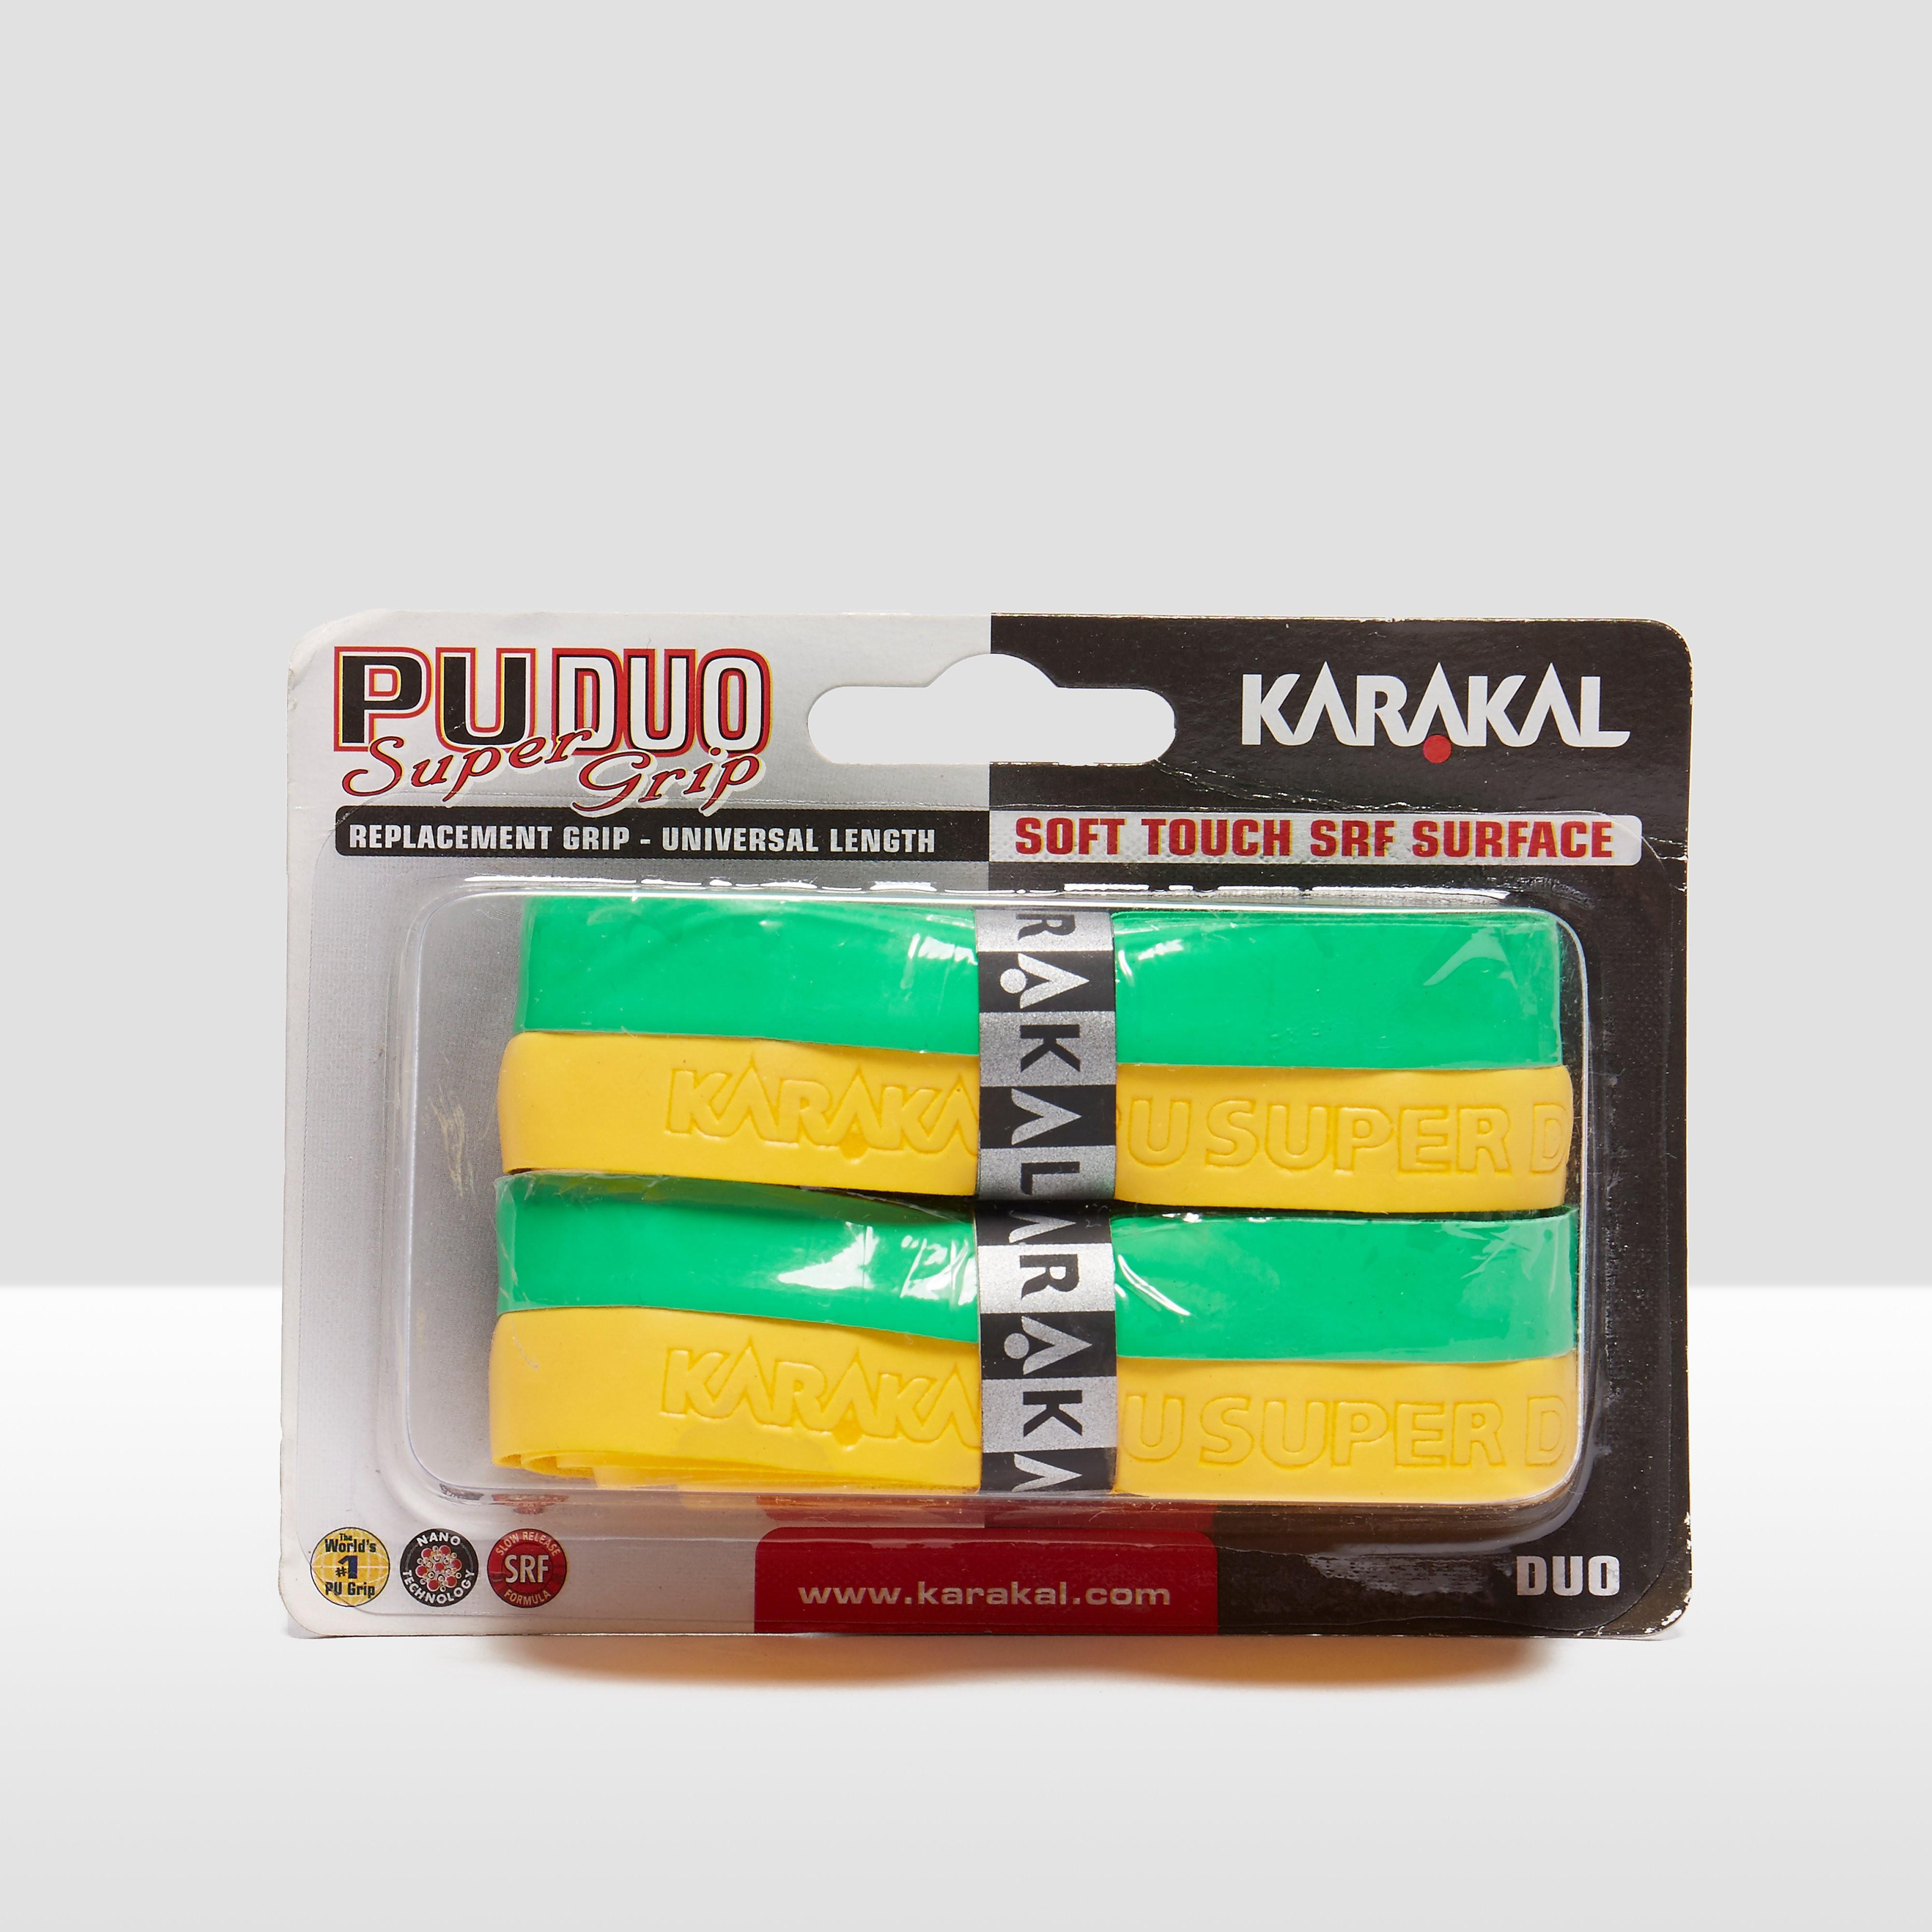 Karakal PU Super Duo Racket Grip